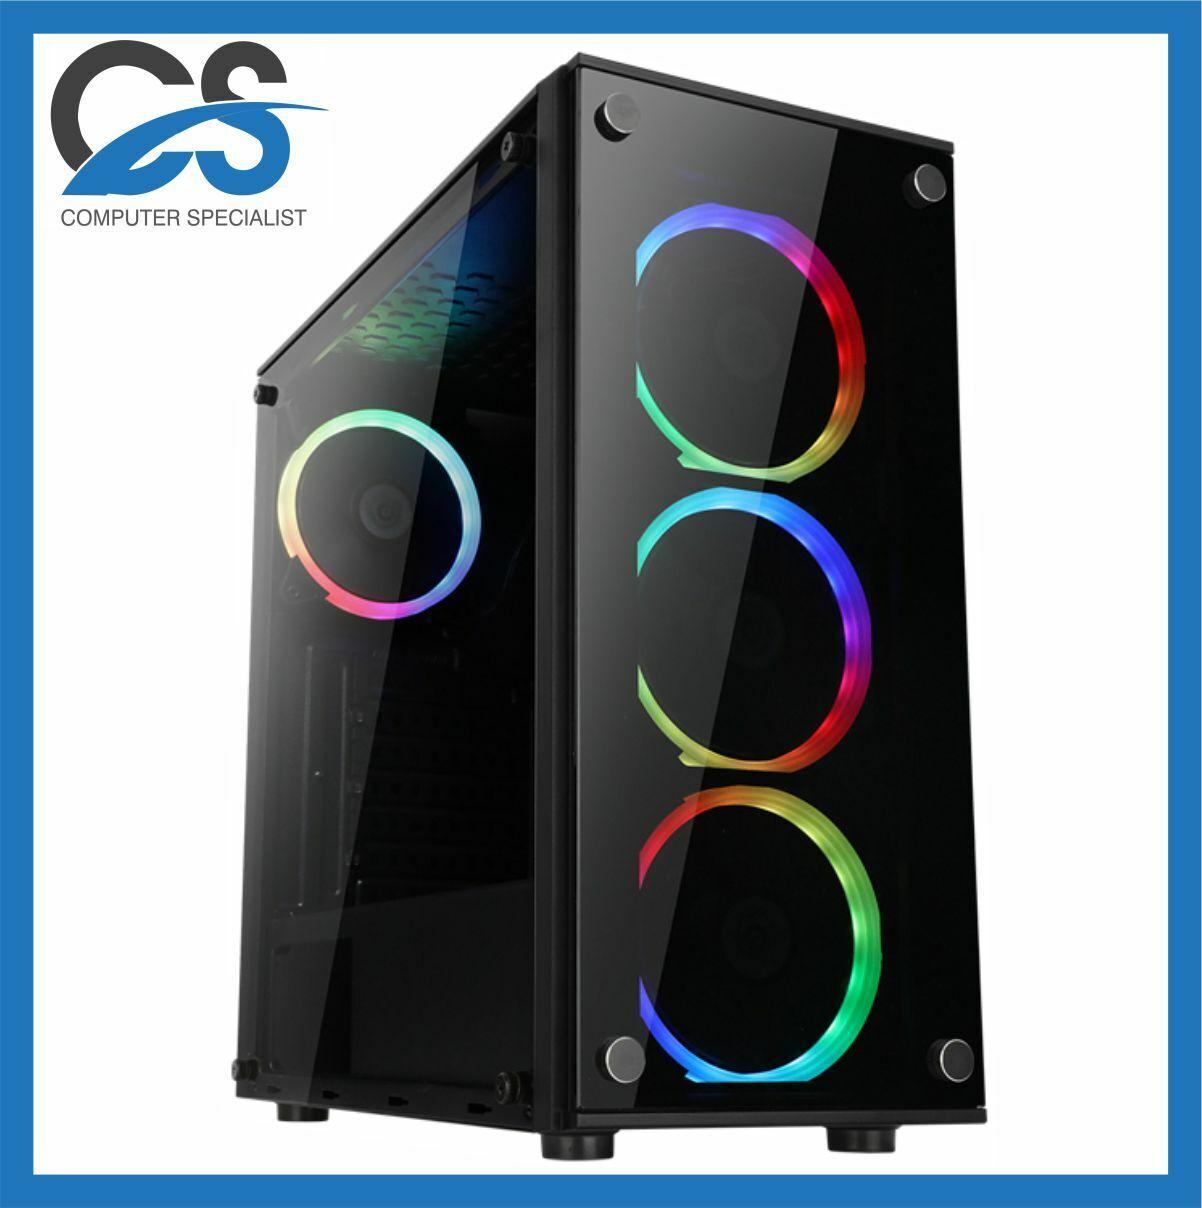 Gaming PC Computer Intel Core i7 11700 2TB HDD 480GB SSD 16GB RAM 6GB GTX 1660